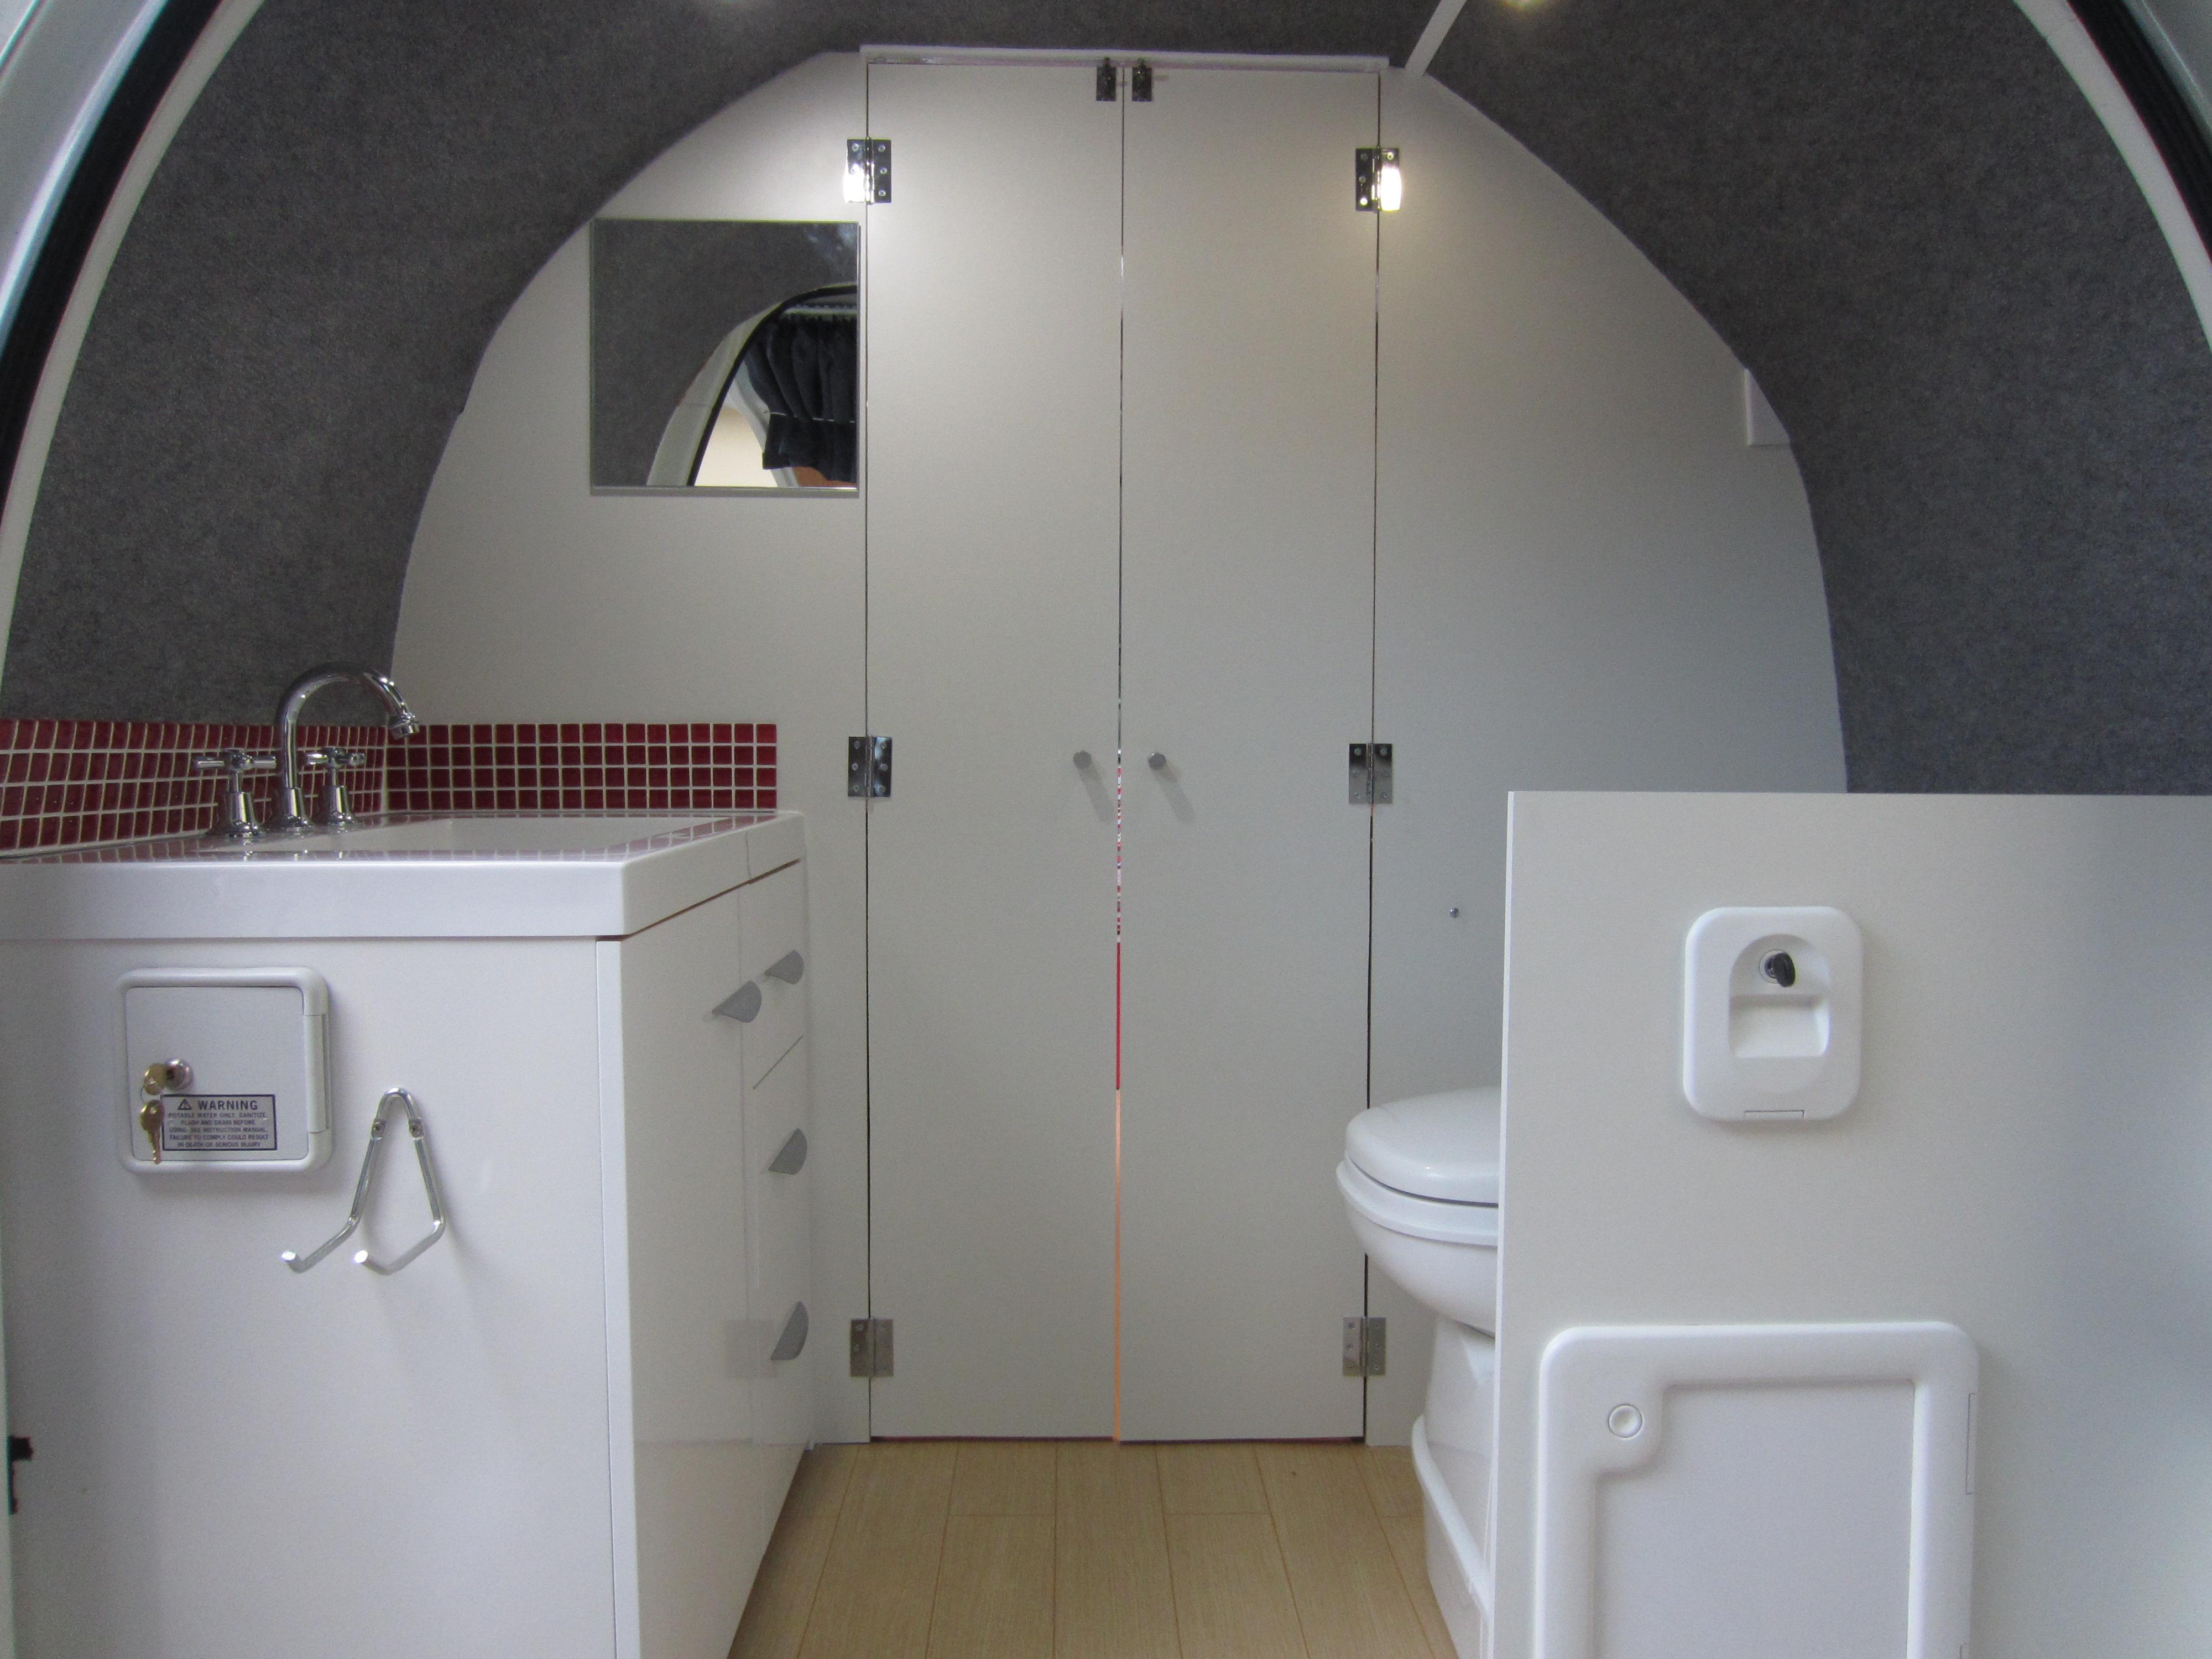 Campervan Bathroom The Campervan Converts